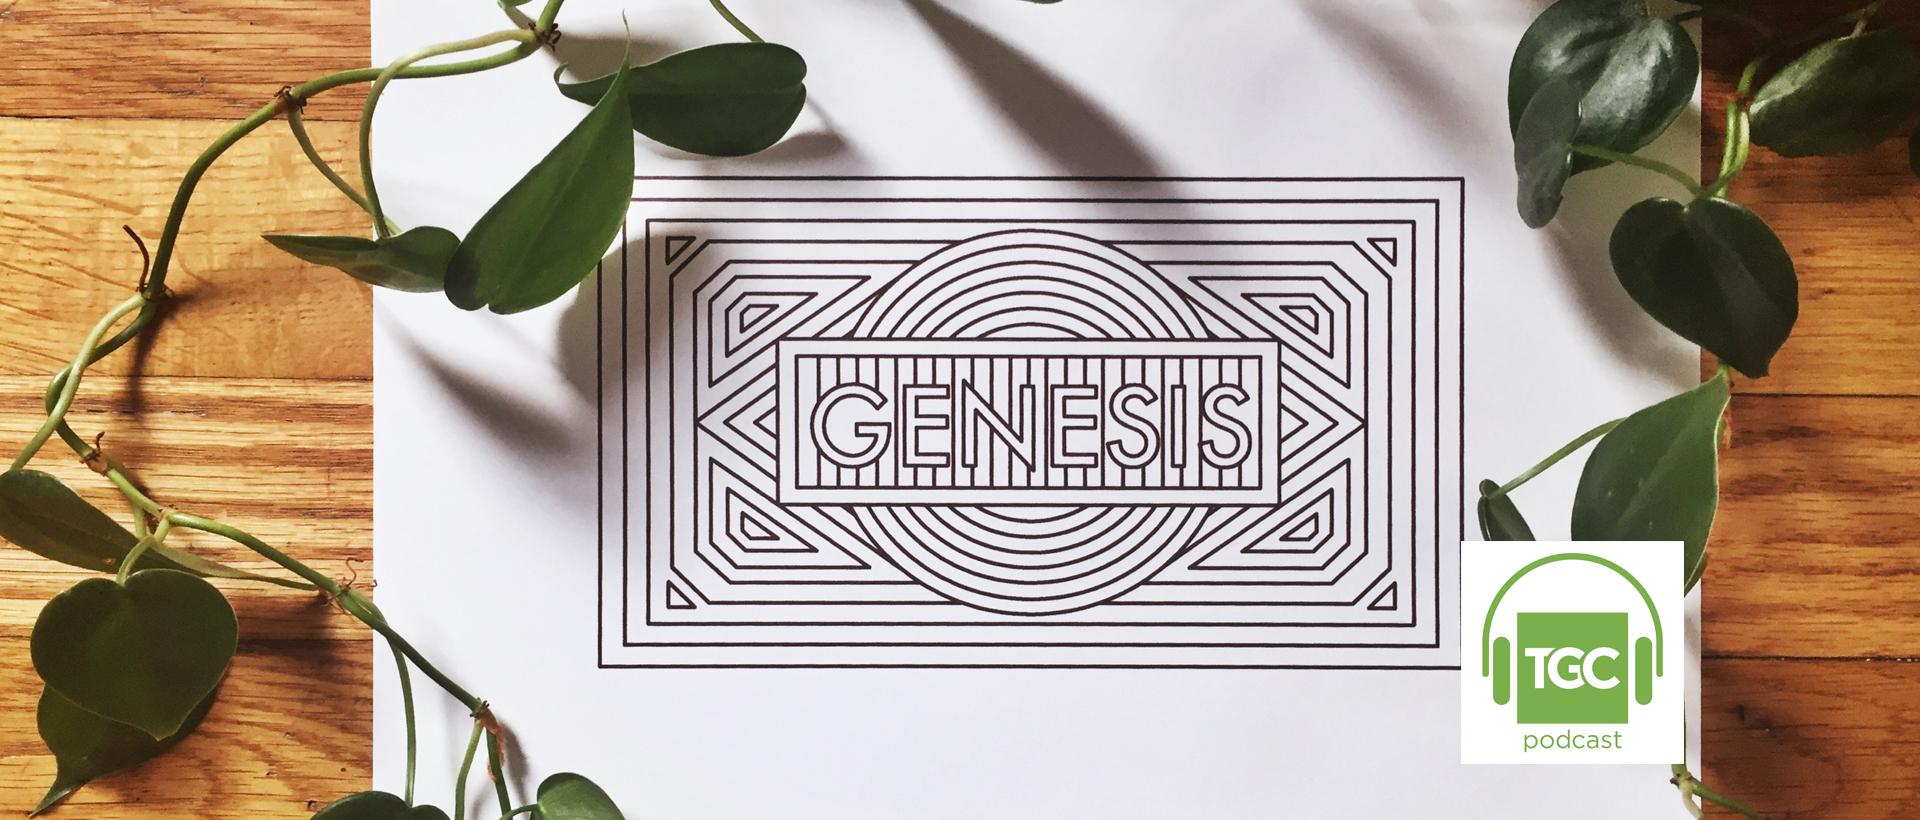 Richard Phillips on How to Teach Genesis